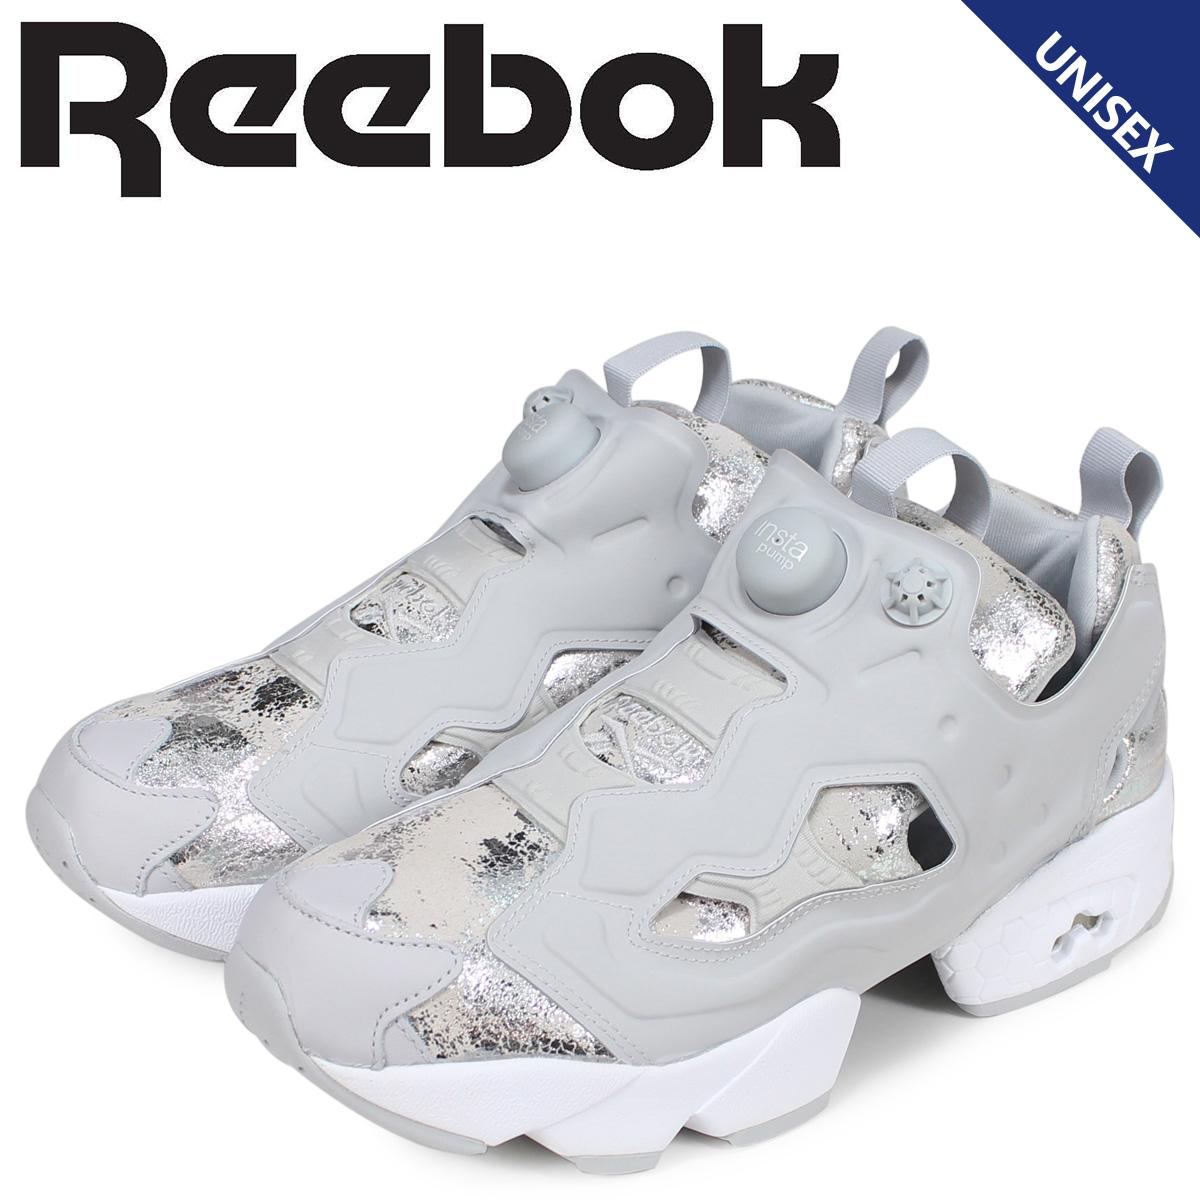 Reebok リーボック インスタ ポンプフューリー スニーカー レディース メンズ INSTAPUMP FURY HYPER METALLIC グレー CN0240